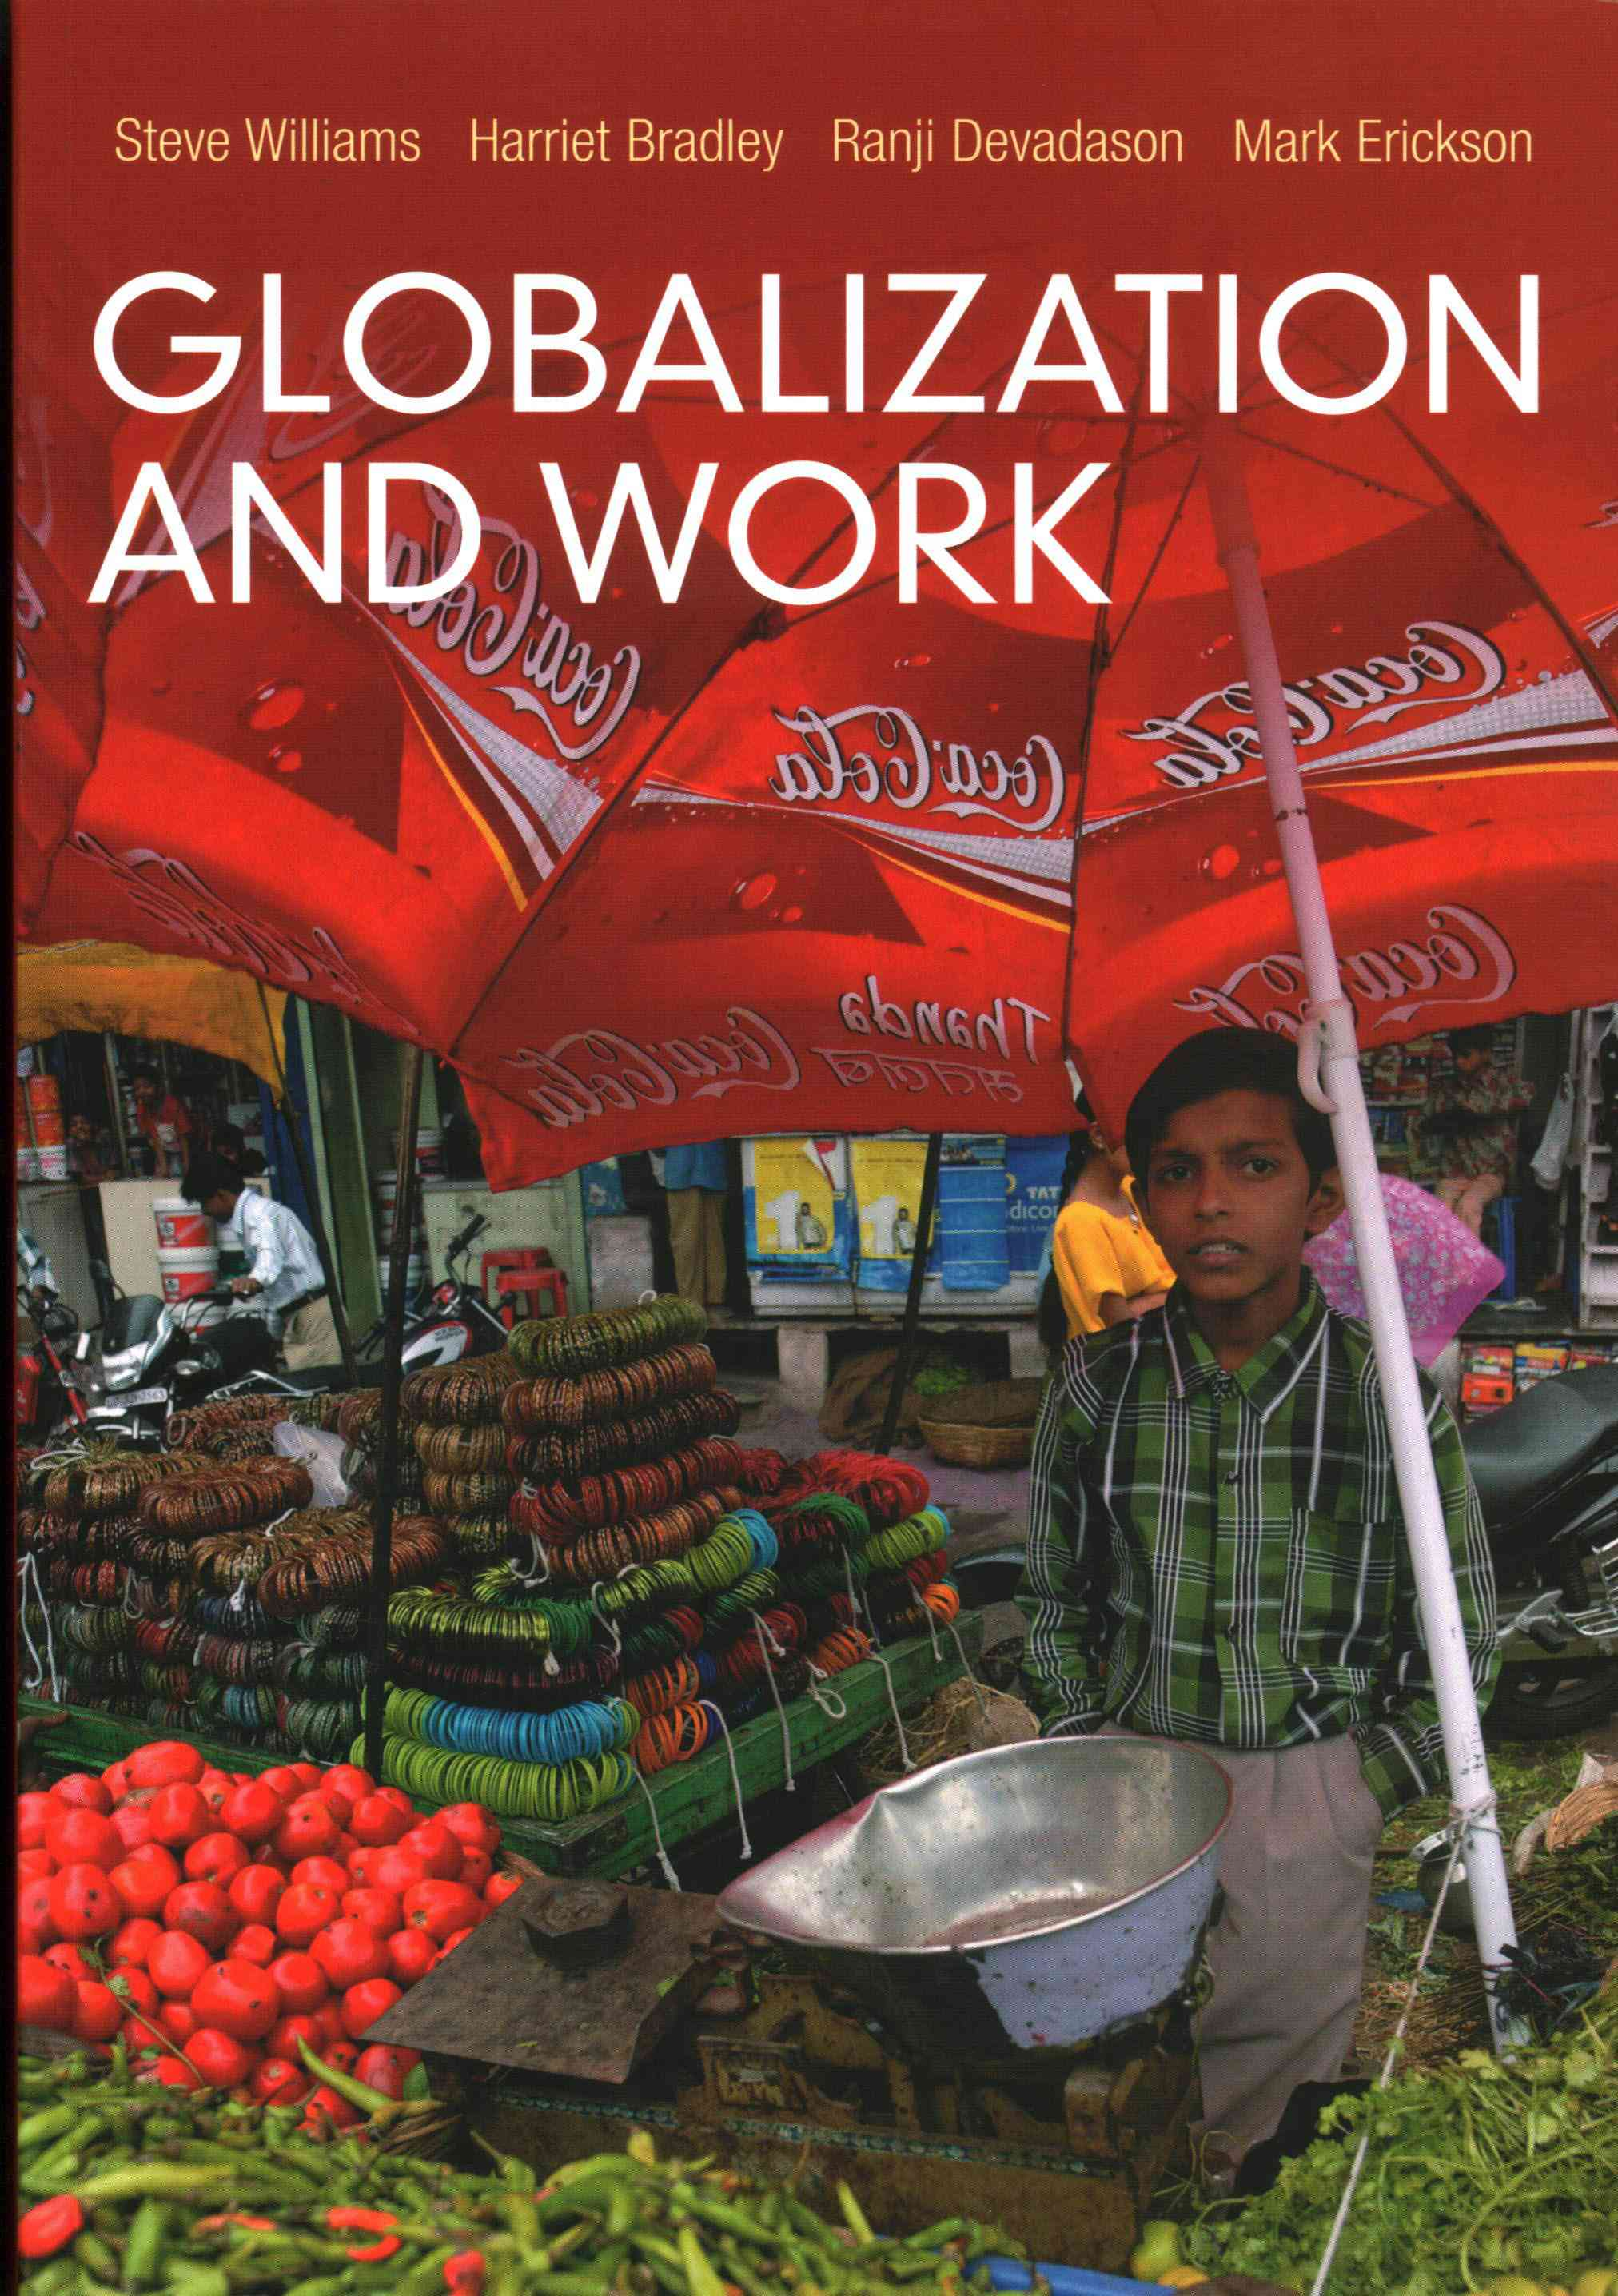 Globalization and Work By Williams, Steve/ Bradley, Harriet/ Devadson, Ranji/ Erickson, Mark